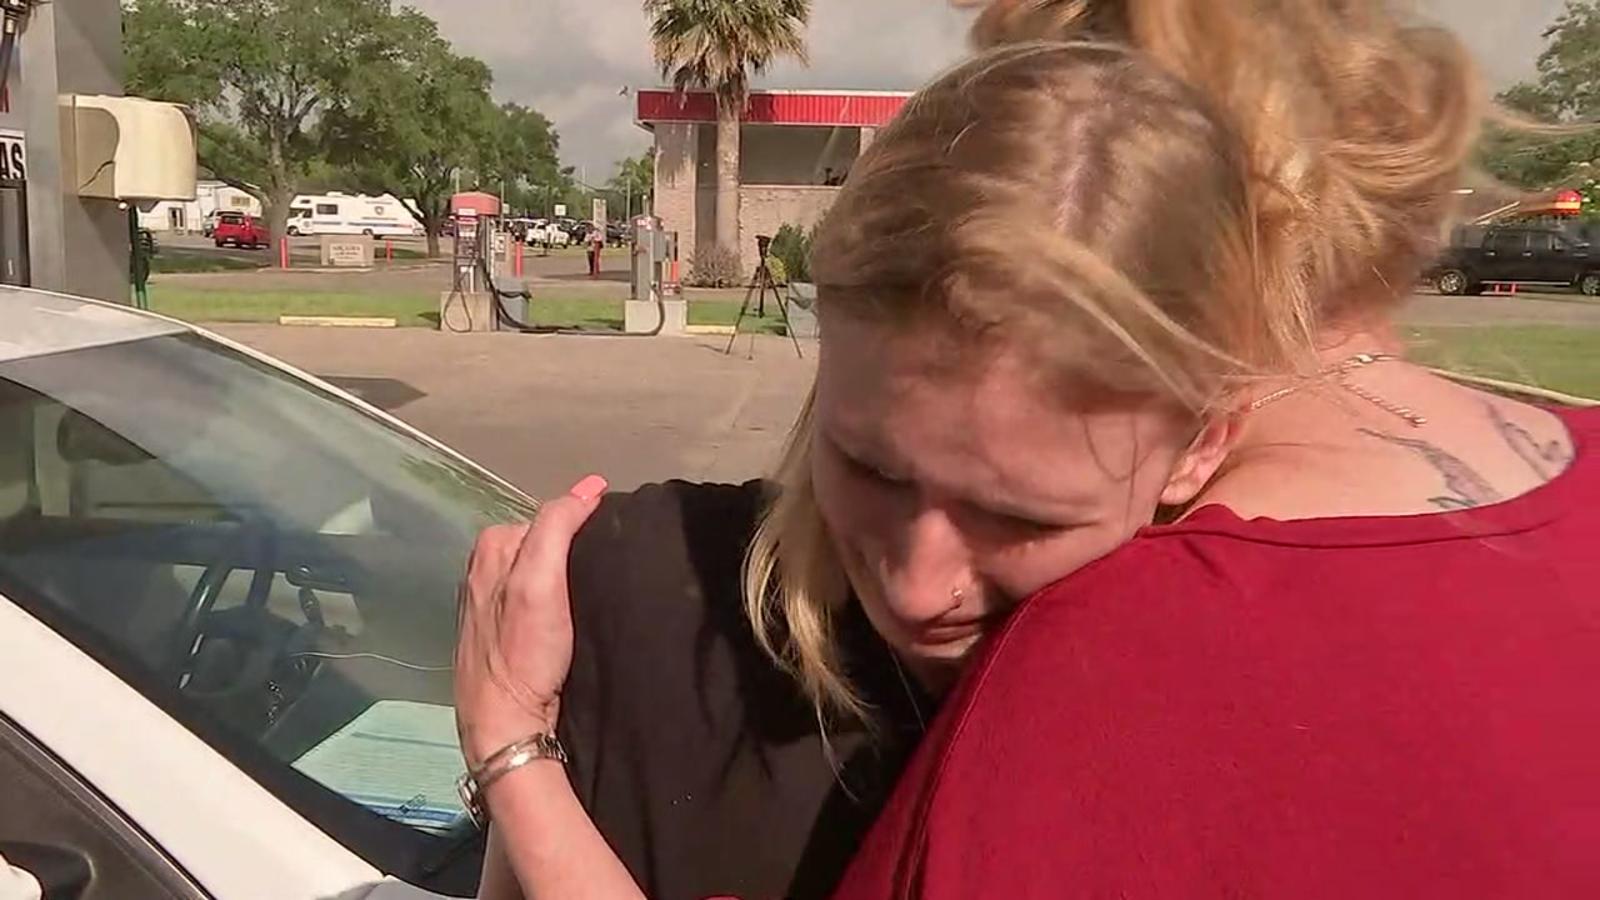 10 dead, 13 injured in shooting at Santa Fe High School